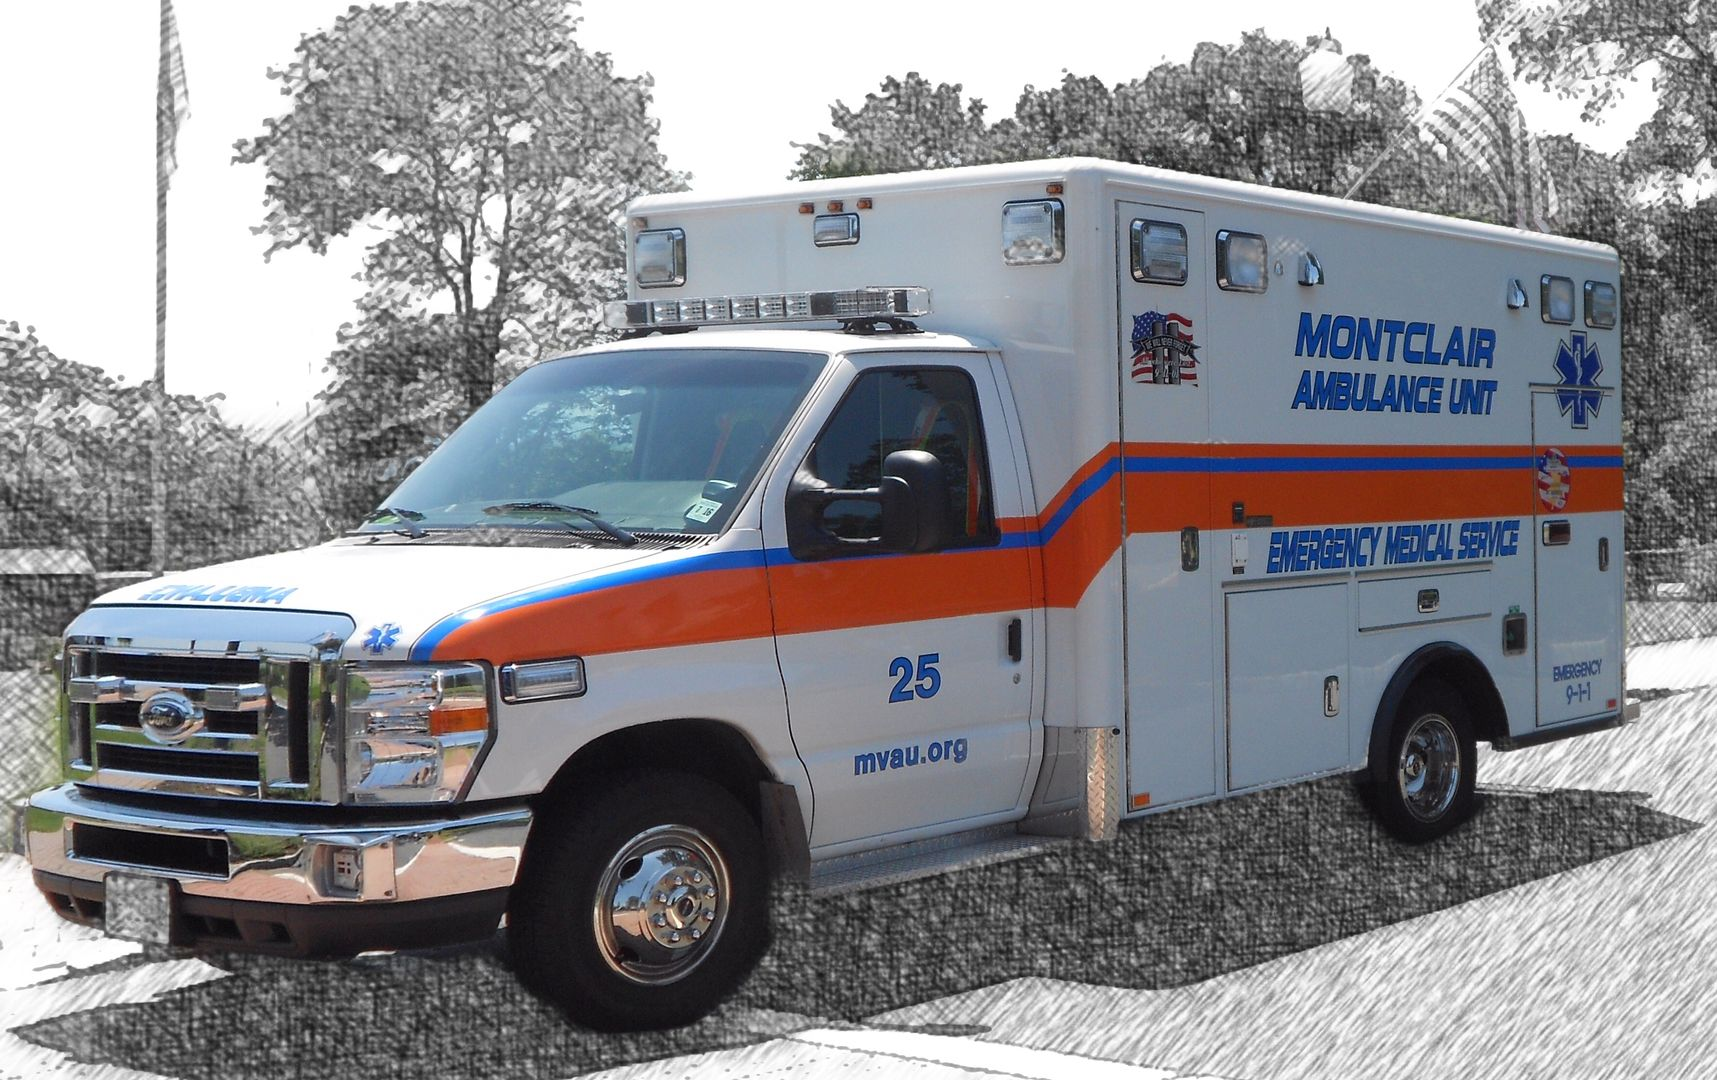 Montclair ambulance unit our mission is to provide